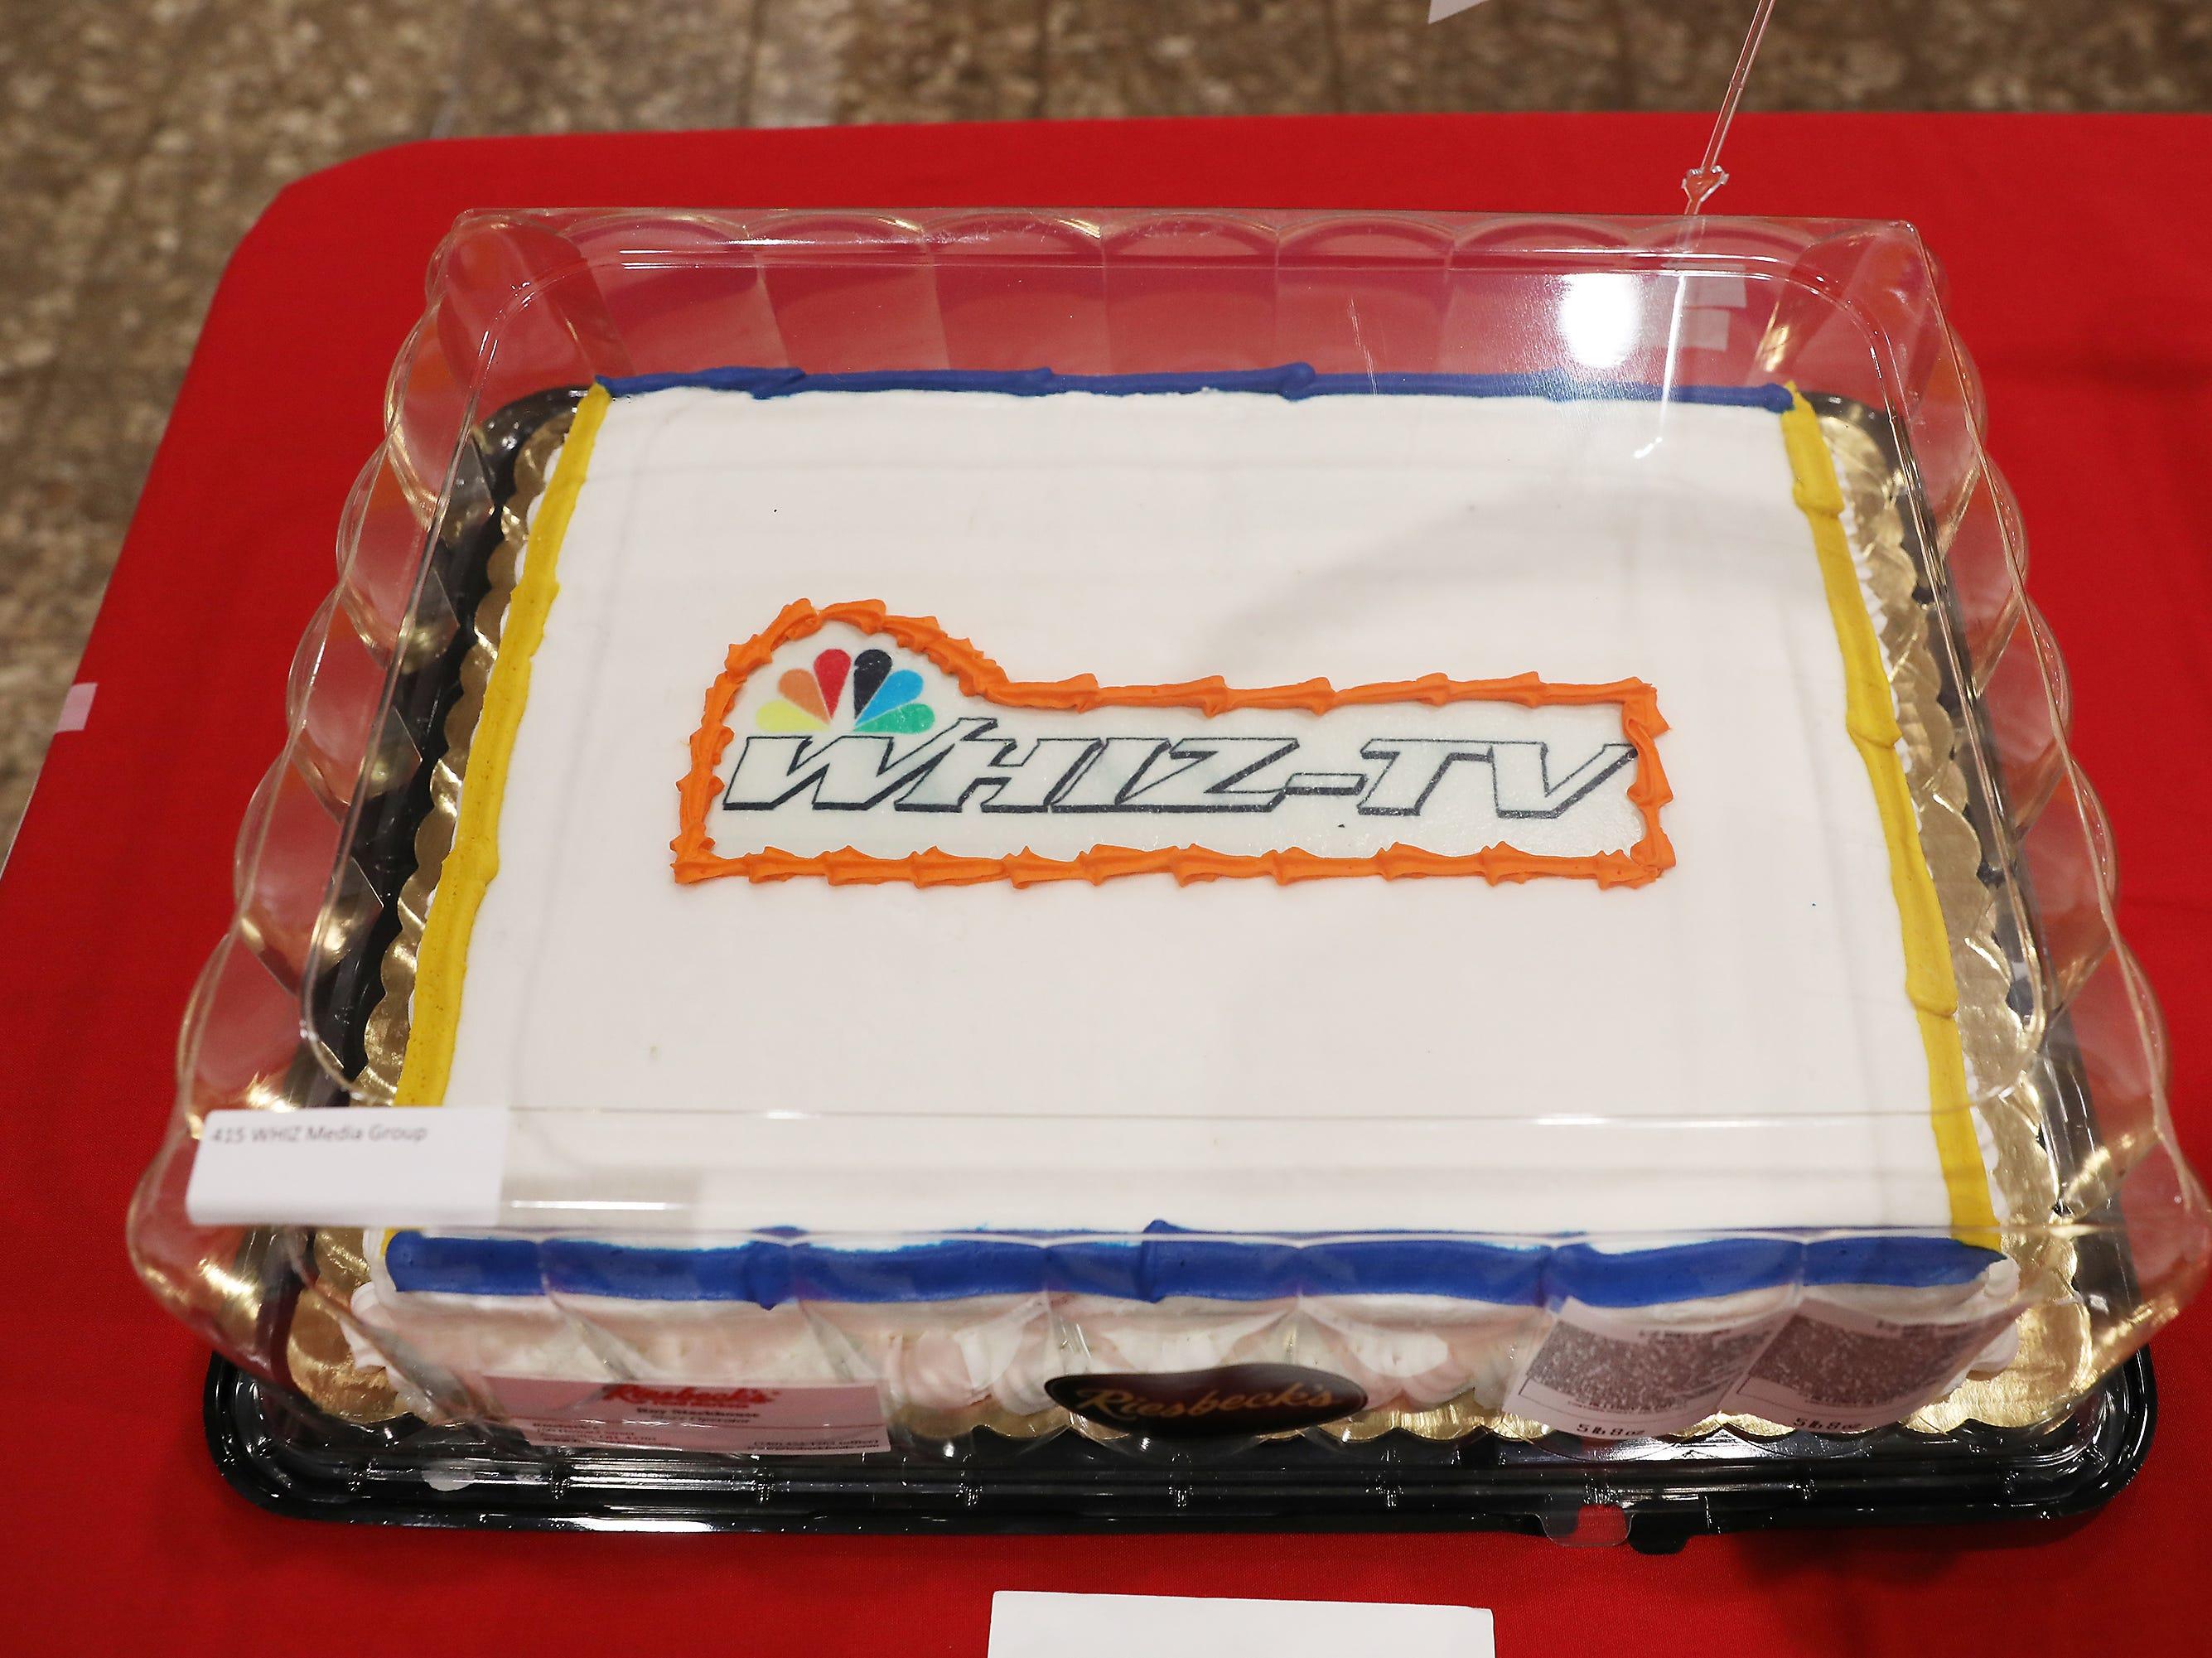 5:45 P.M. Friday cake 415 WHIZ Media Group - $1,000 TV, $1,000 radio advertising.